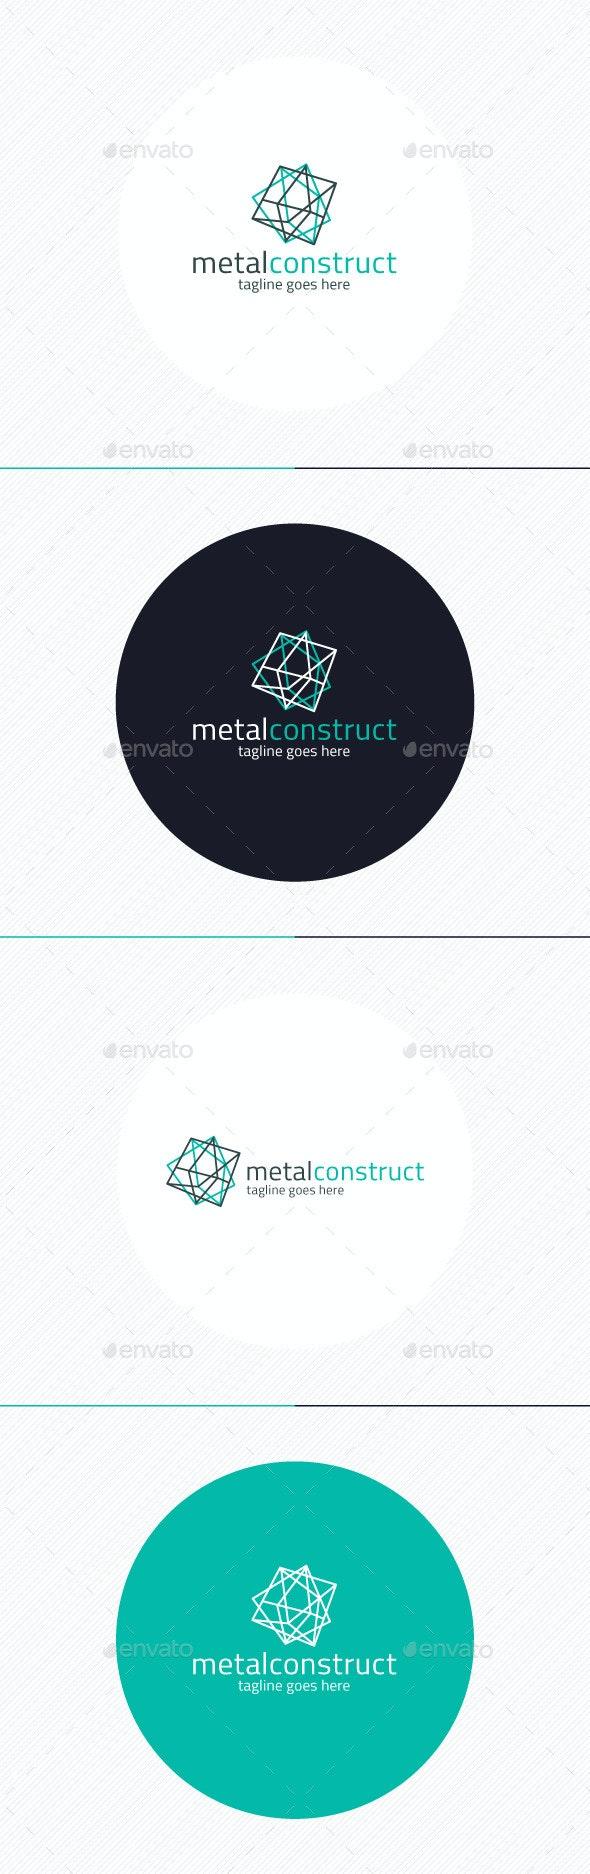 Metal Construct Logo - Vector Abstract